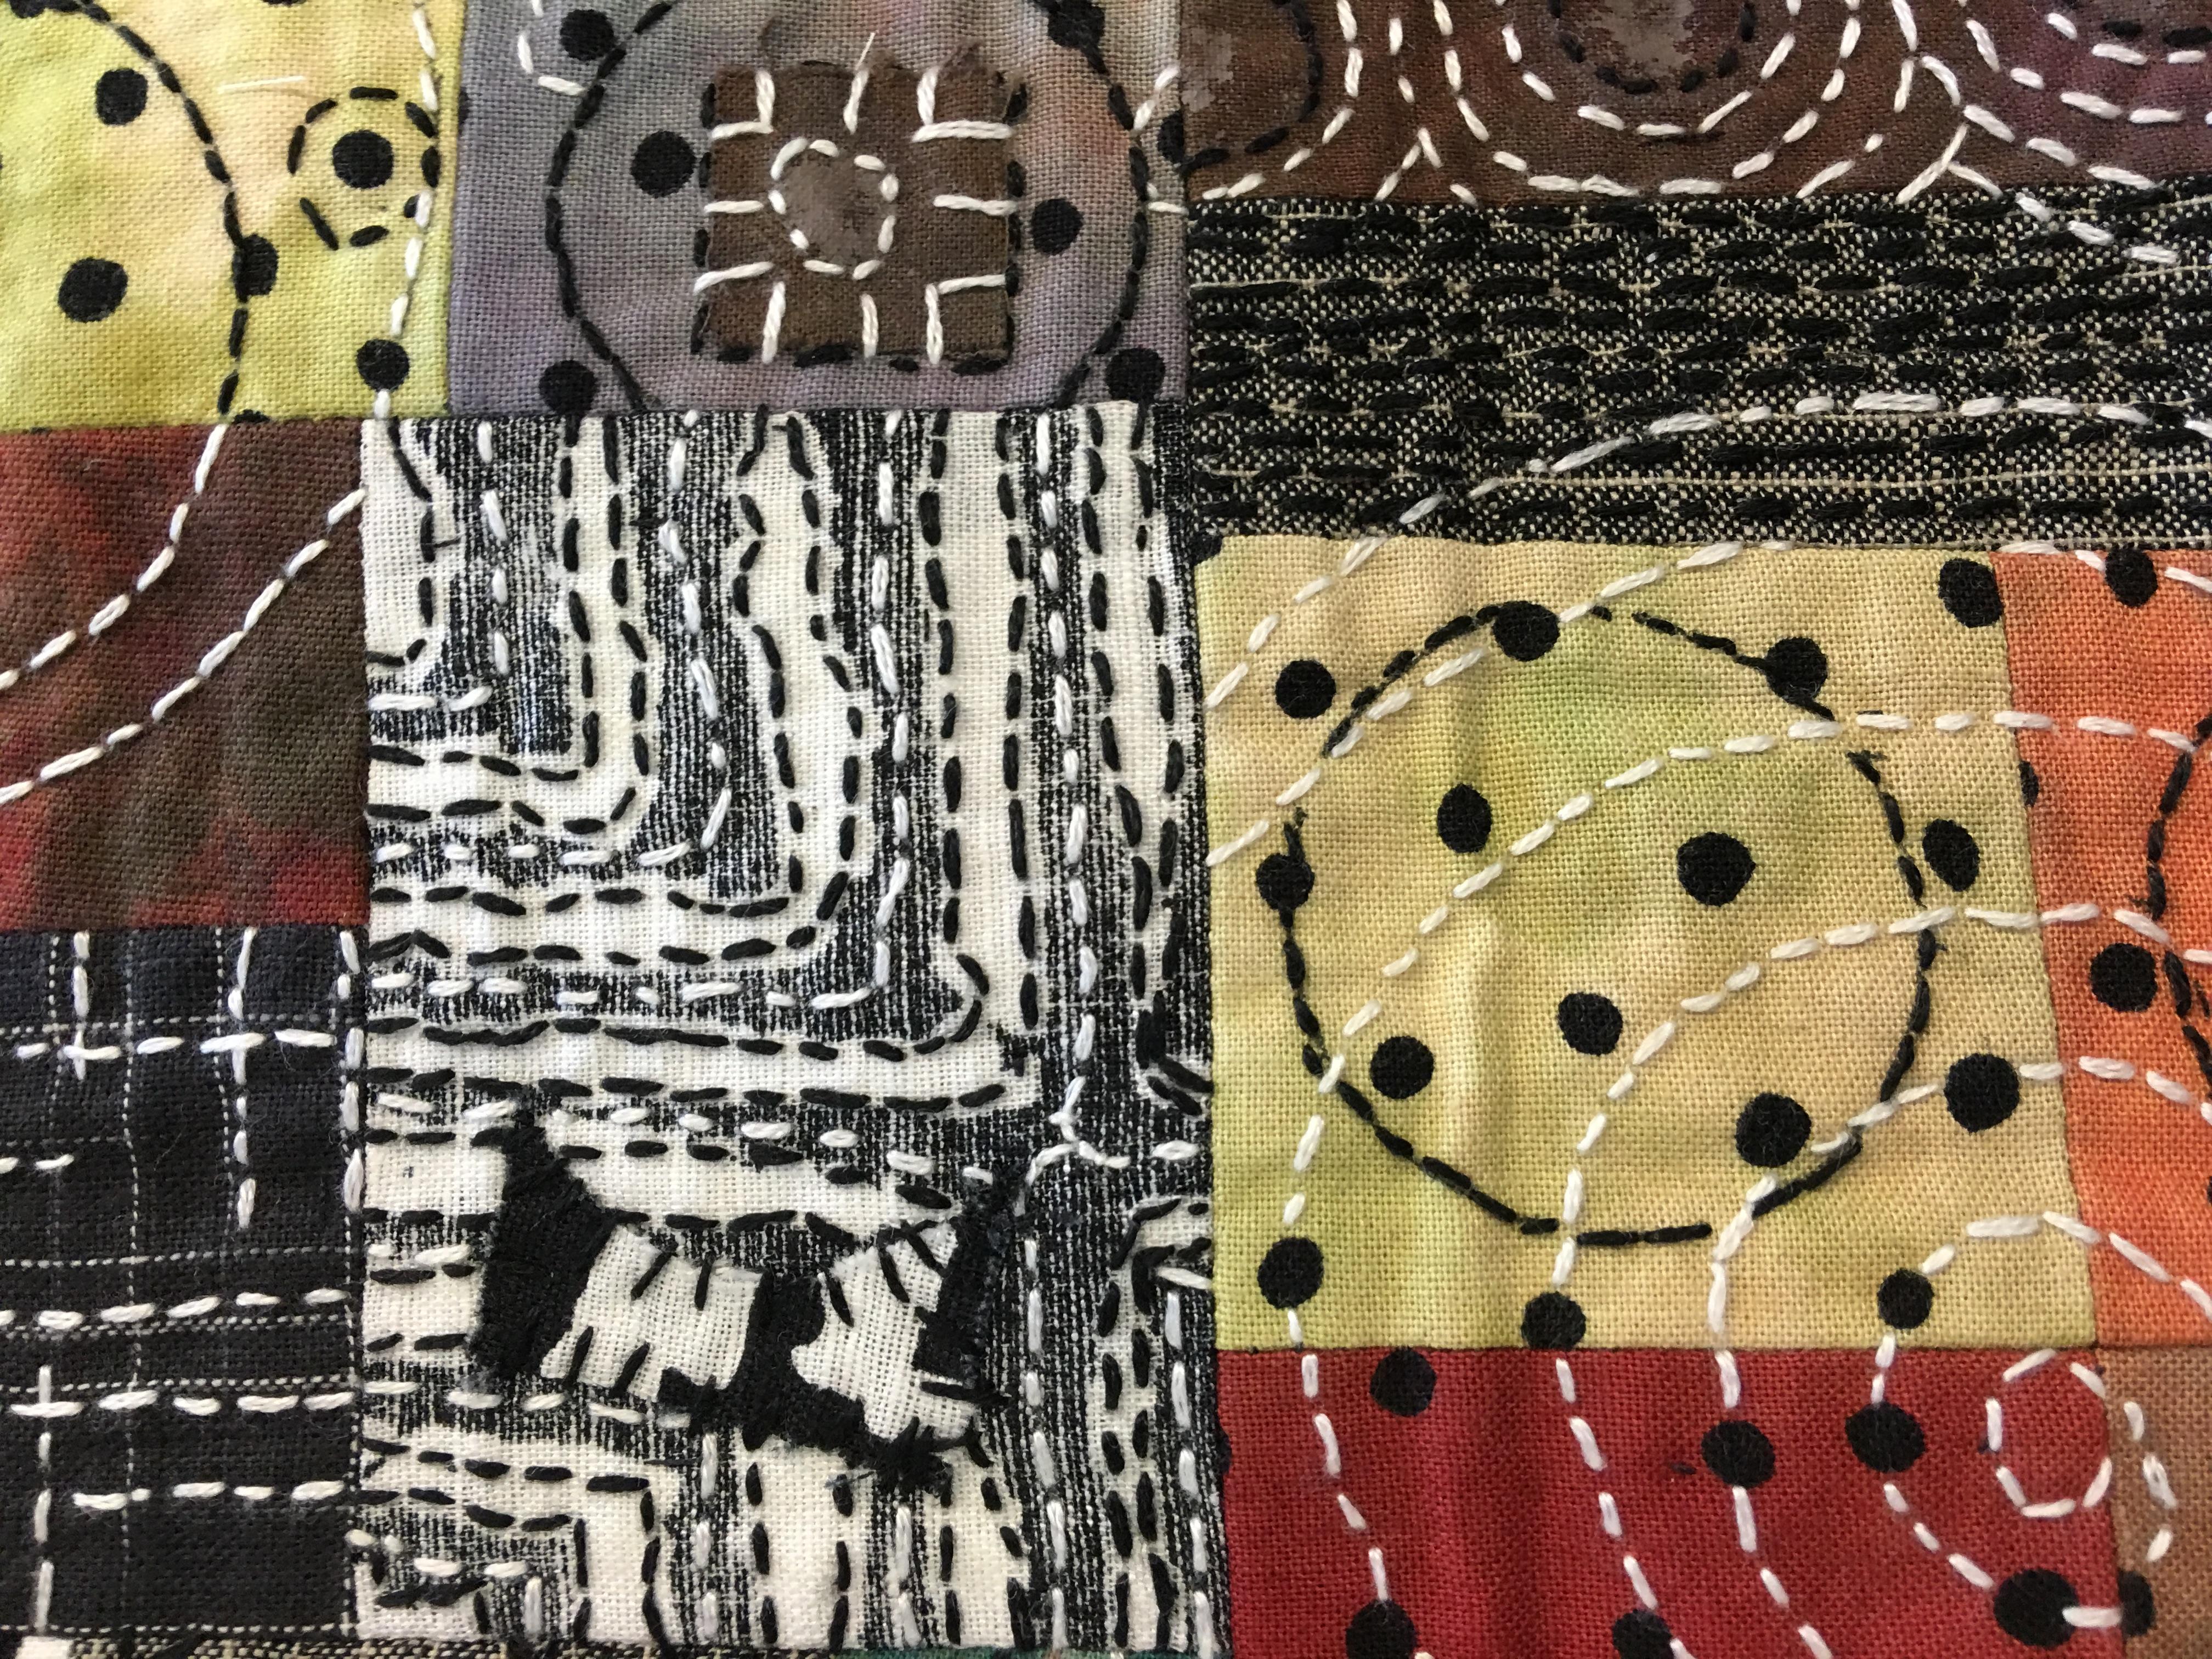 Image of Japanese boro needle work by Mary Ruth Smith